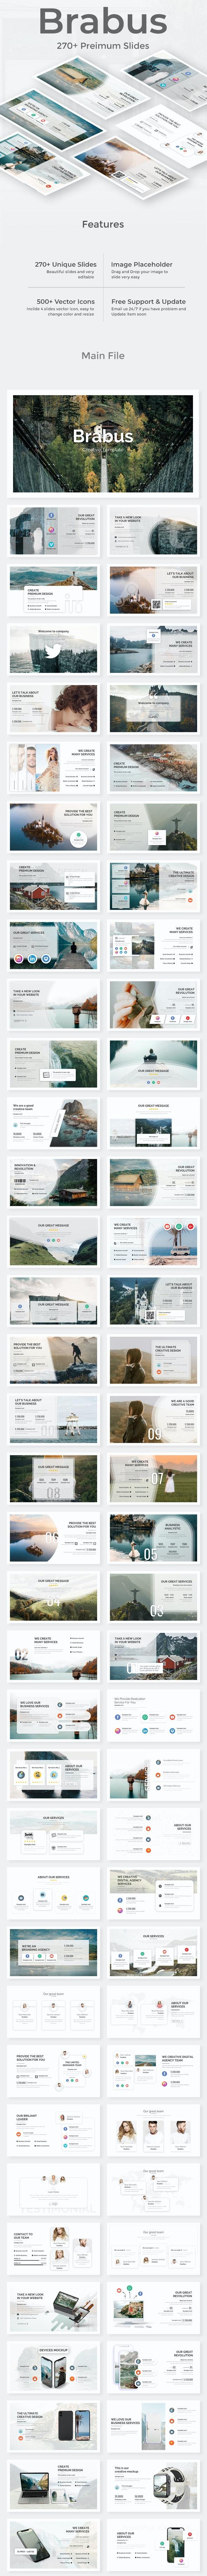 Brabus Premium Keynote Template - Creative Keynote Templates